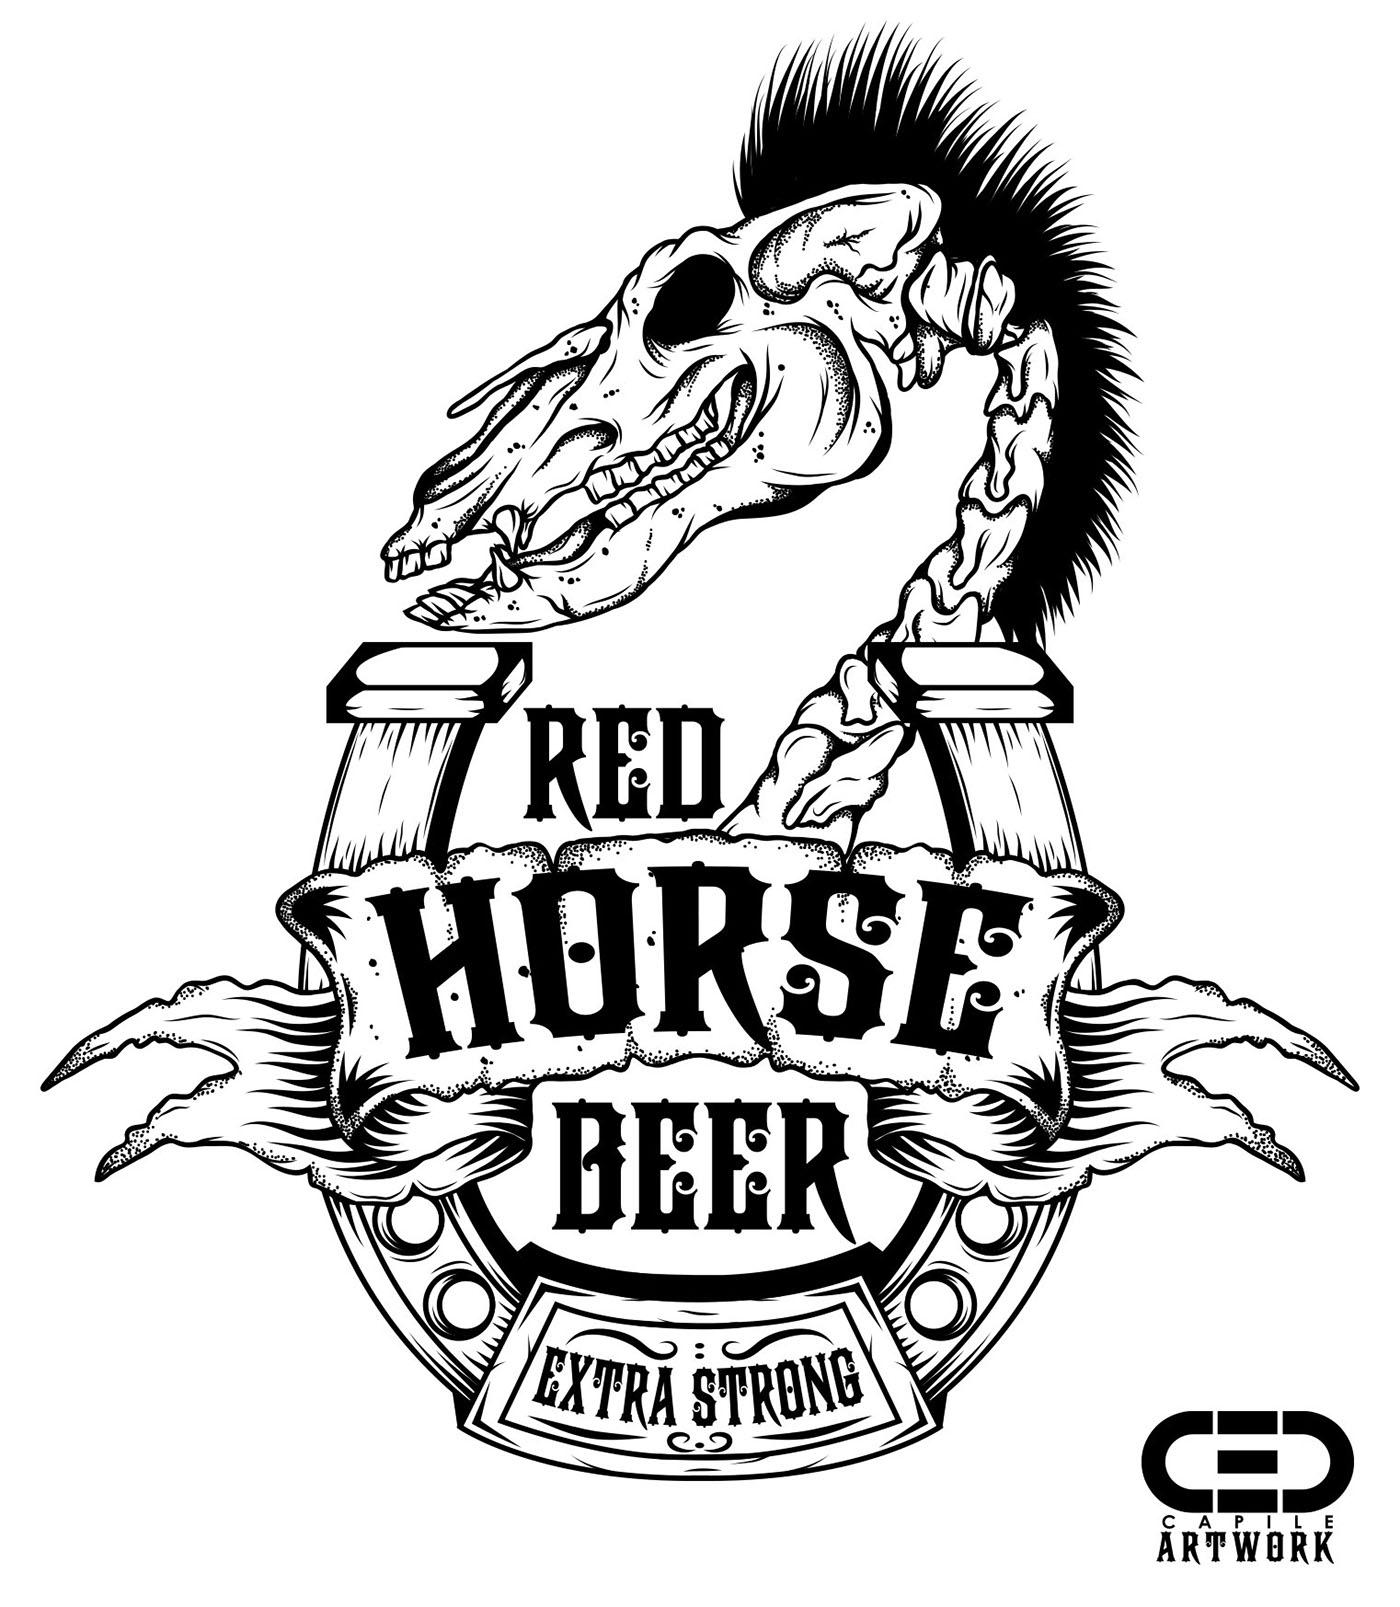 Red Horse Beer Fanart On Behance